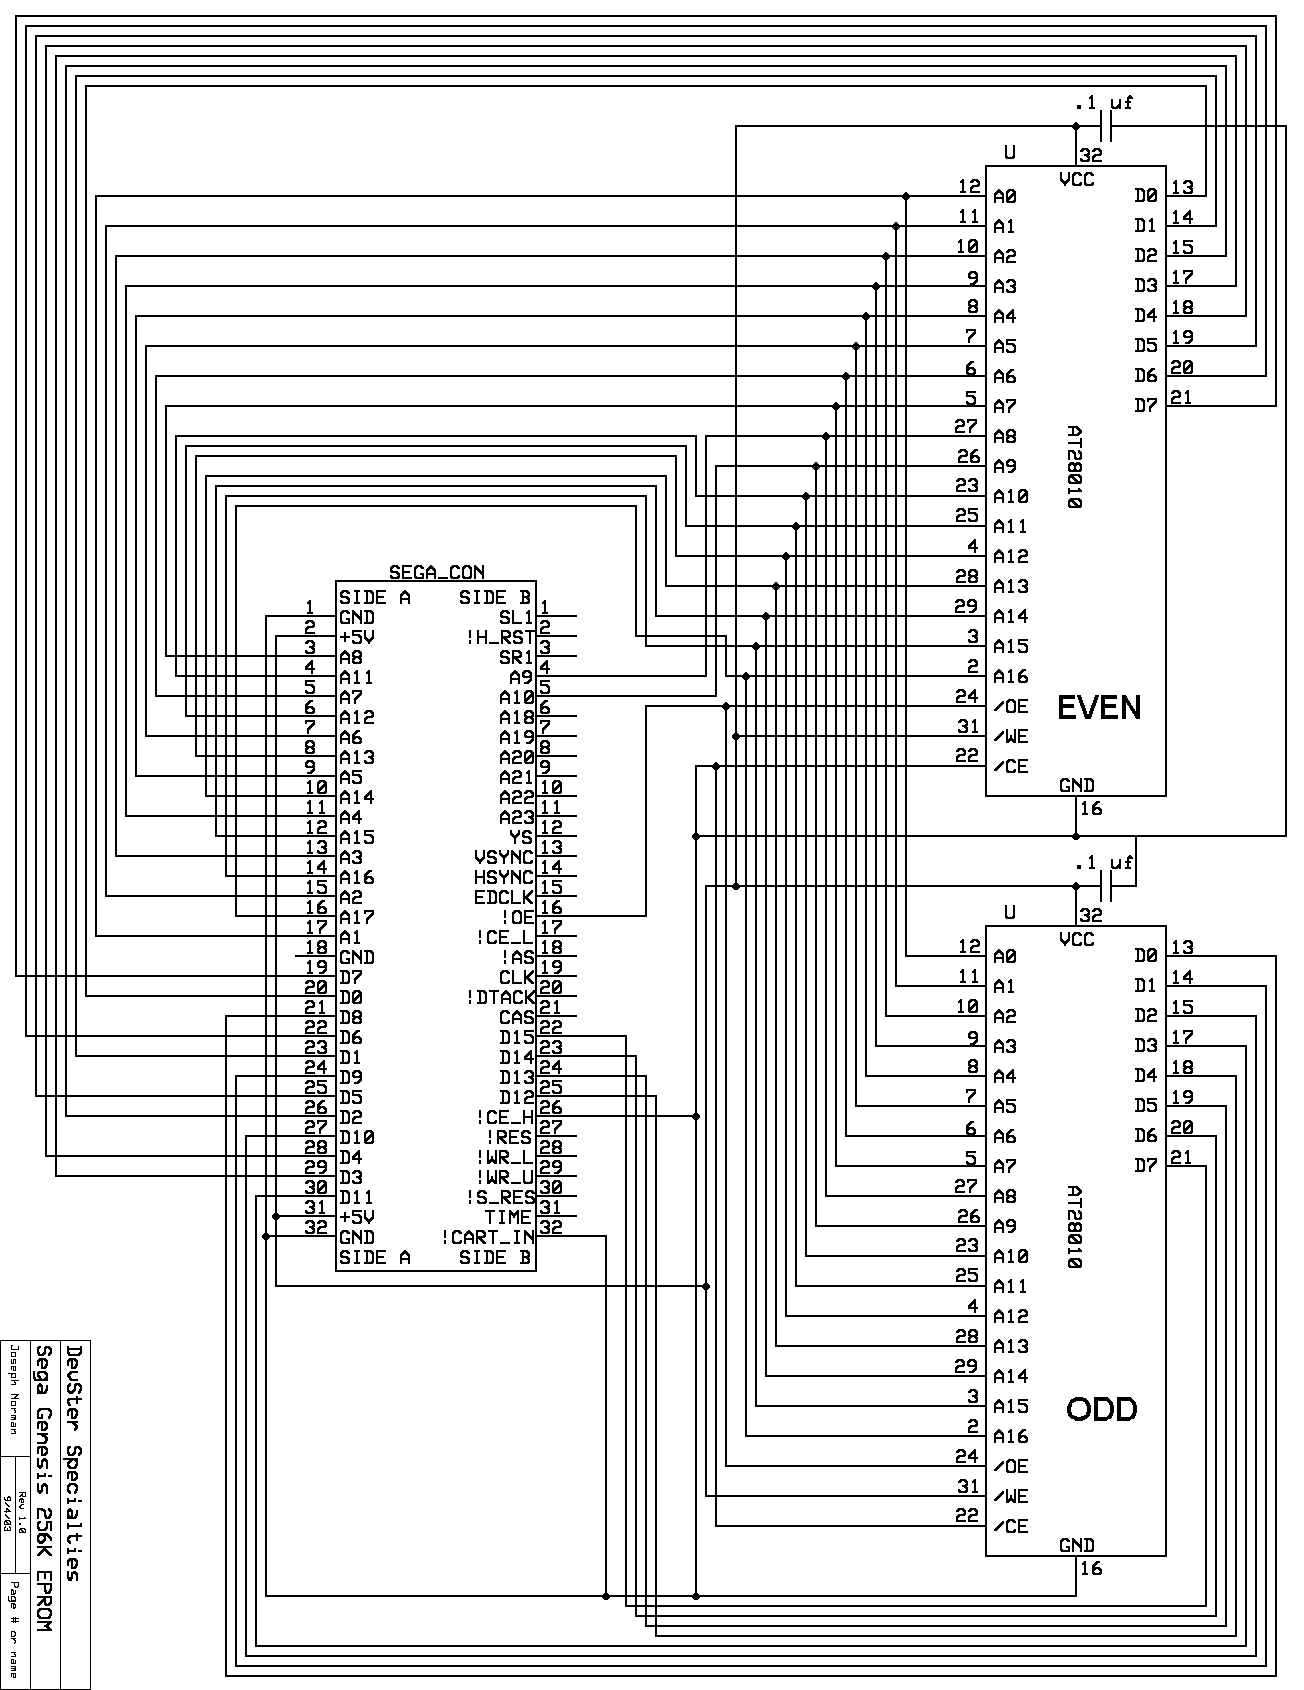 DevSter - Sega Genesis/32X Development Page